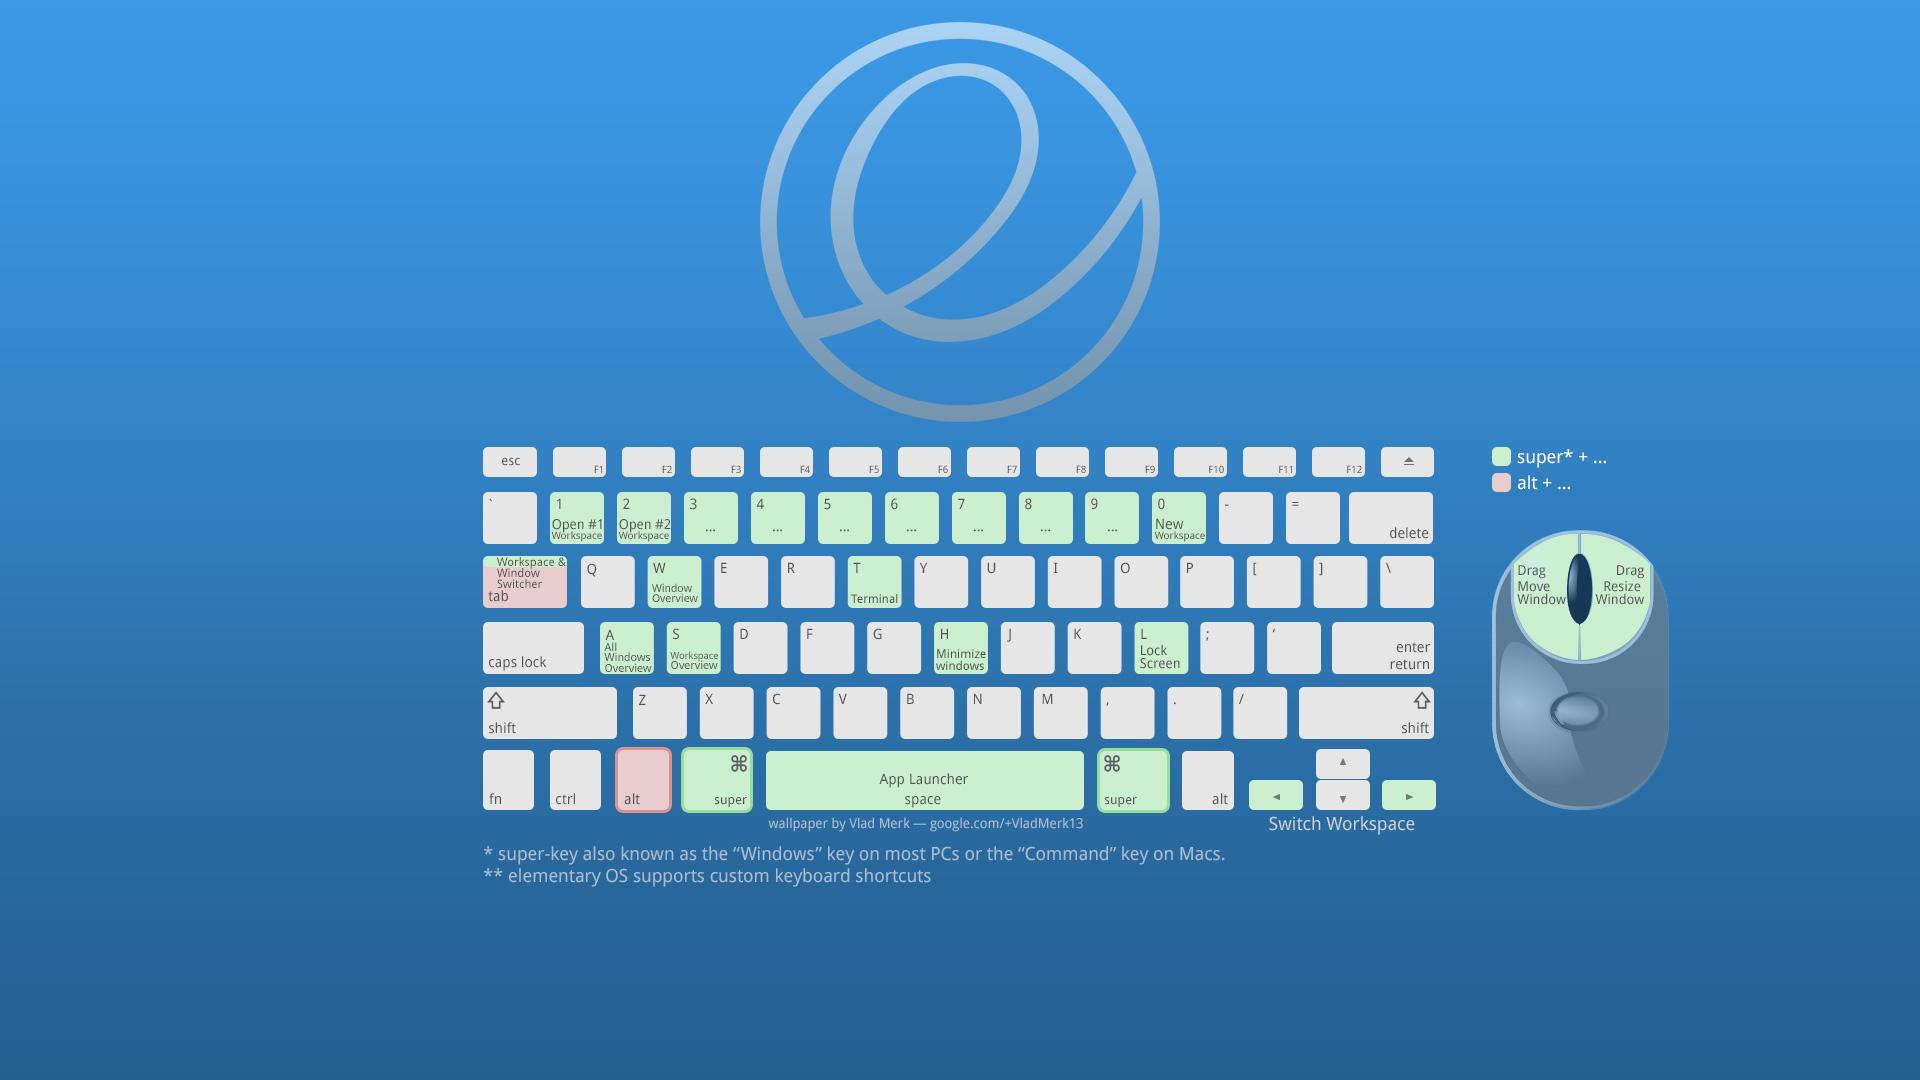 Wallpaper hotkeys for elementary OS version 2 by 13iangel